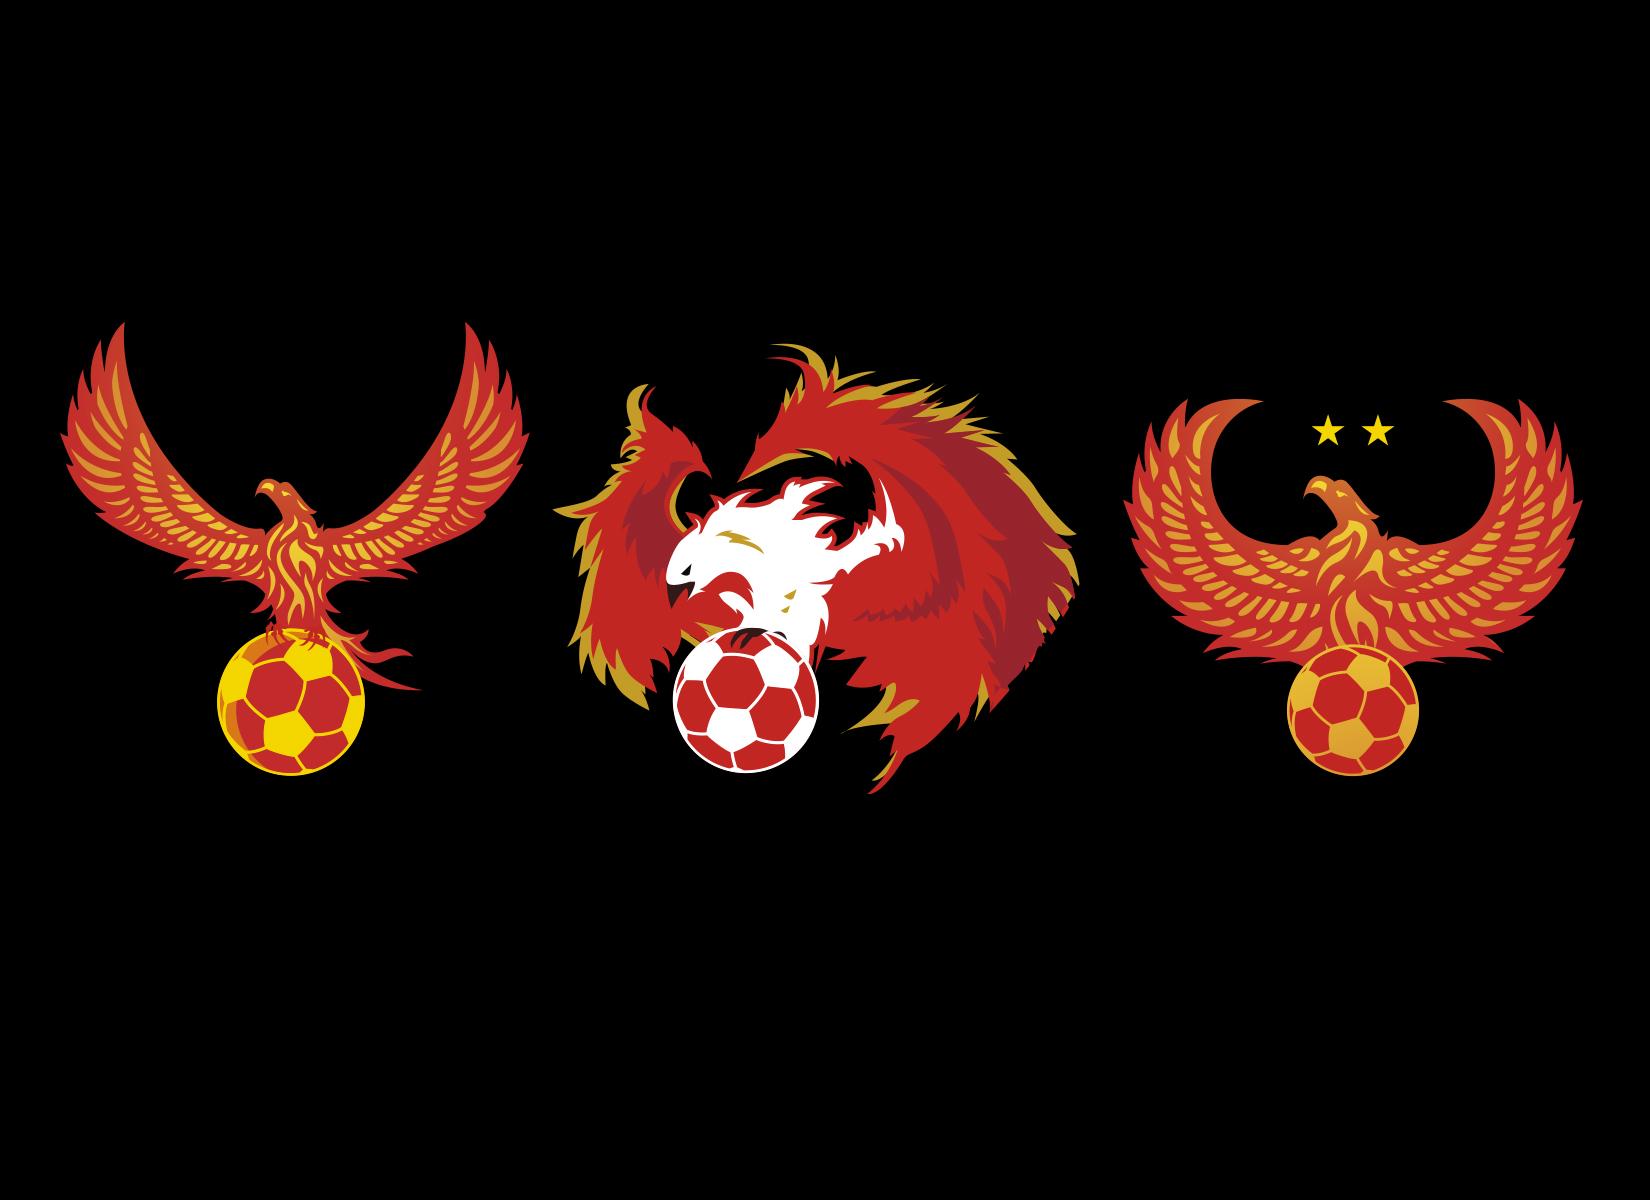 fenix-soccer-academy-custom-soccer-crest-designs-by-jordan-fretz-5.jpg